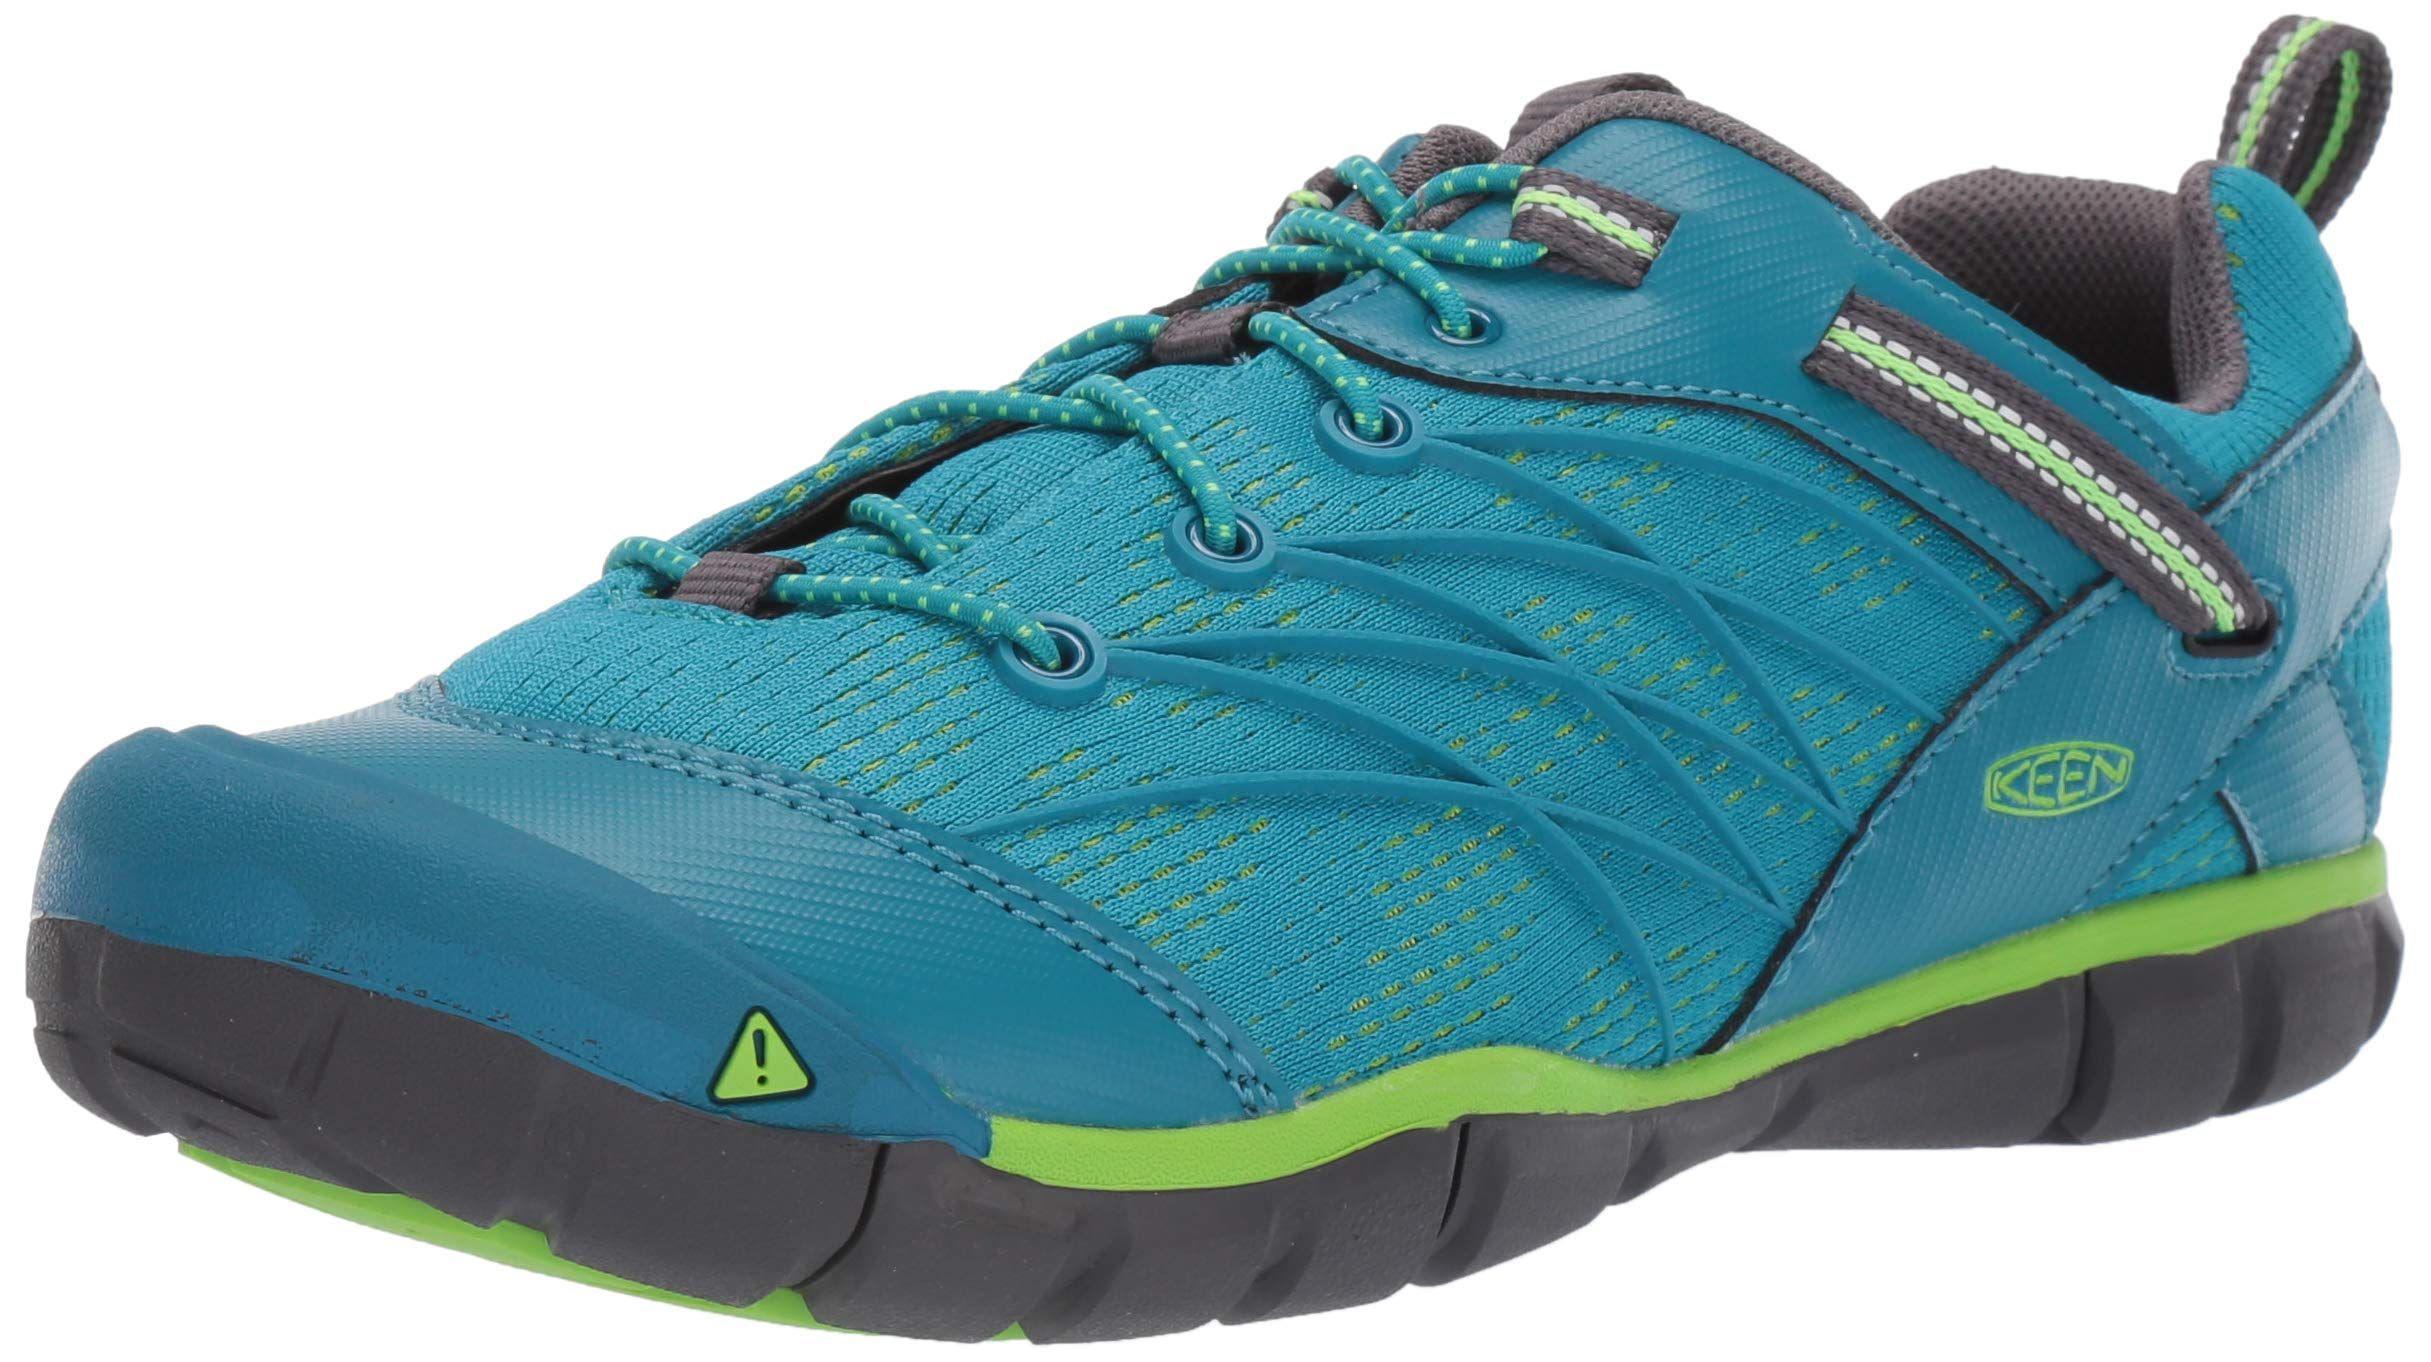 KEEN Unisex Chandler CNX Hiking Shoe, Tahitian Tide/Bright Green, 11 M US Little Kid